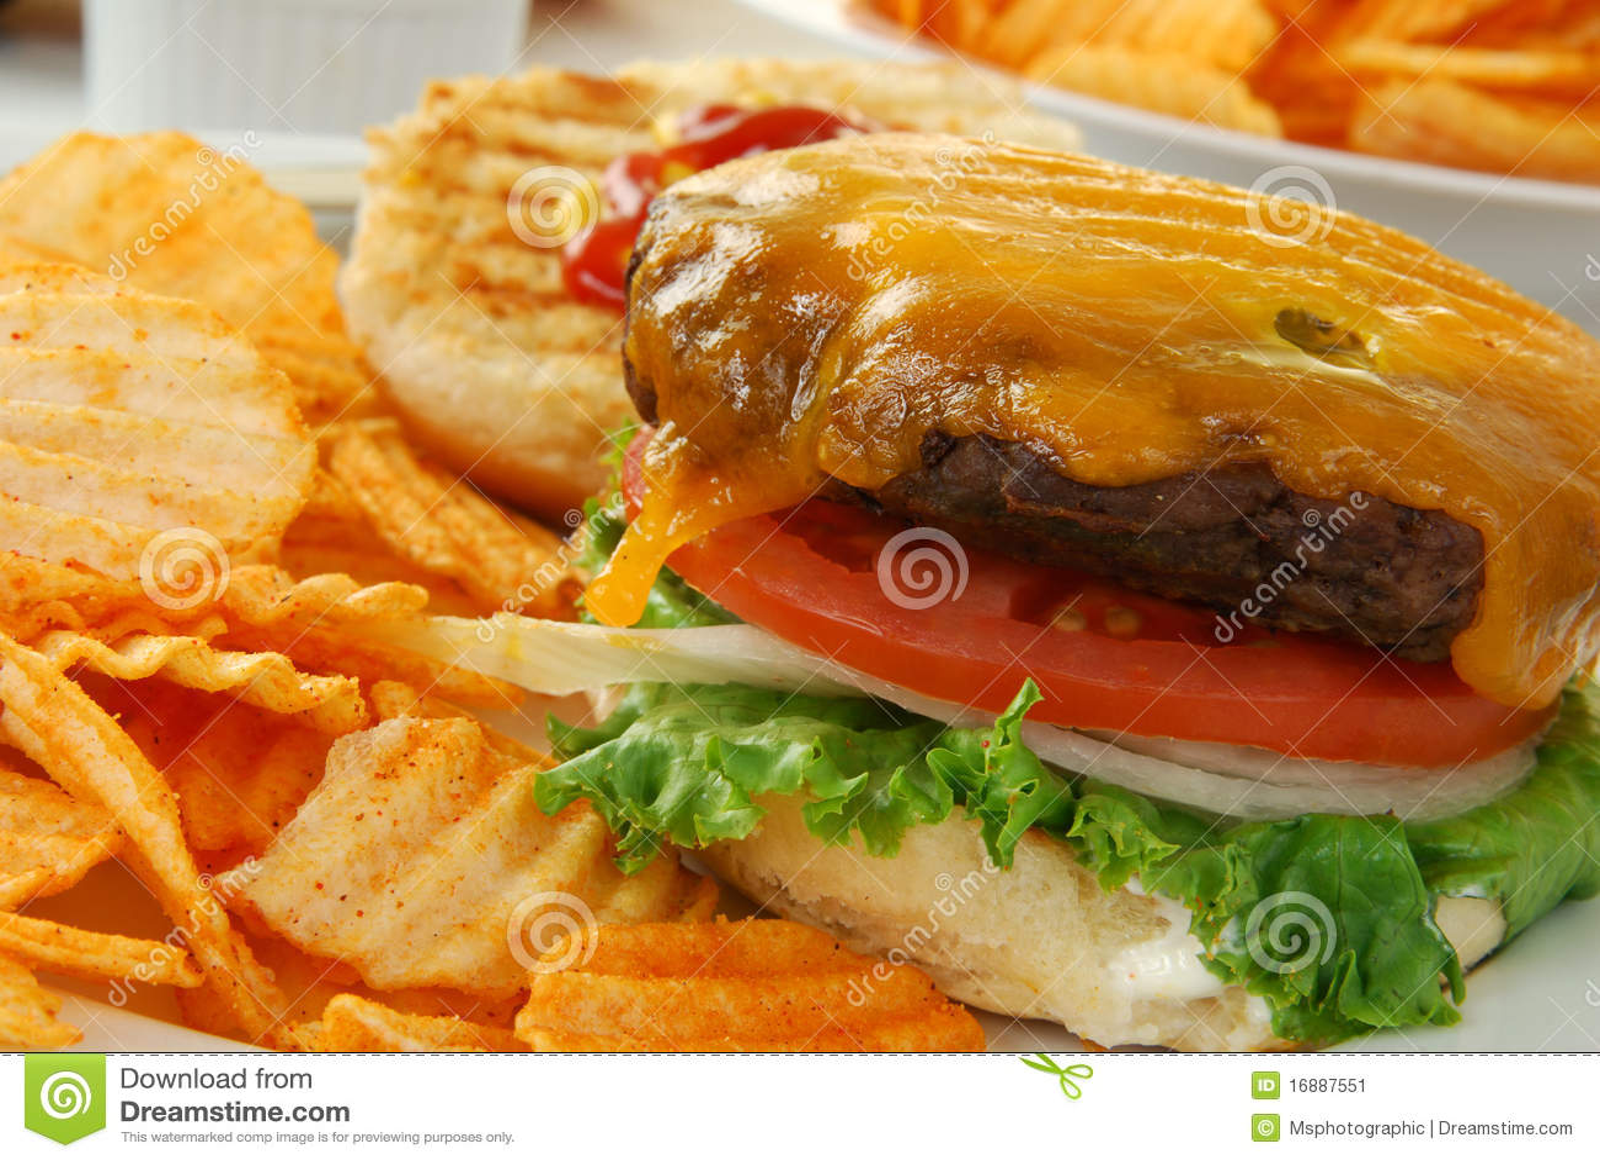 Open Faced Cheeseburger Stock Image - Image: 16887551